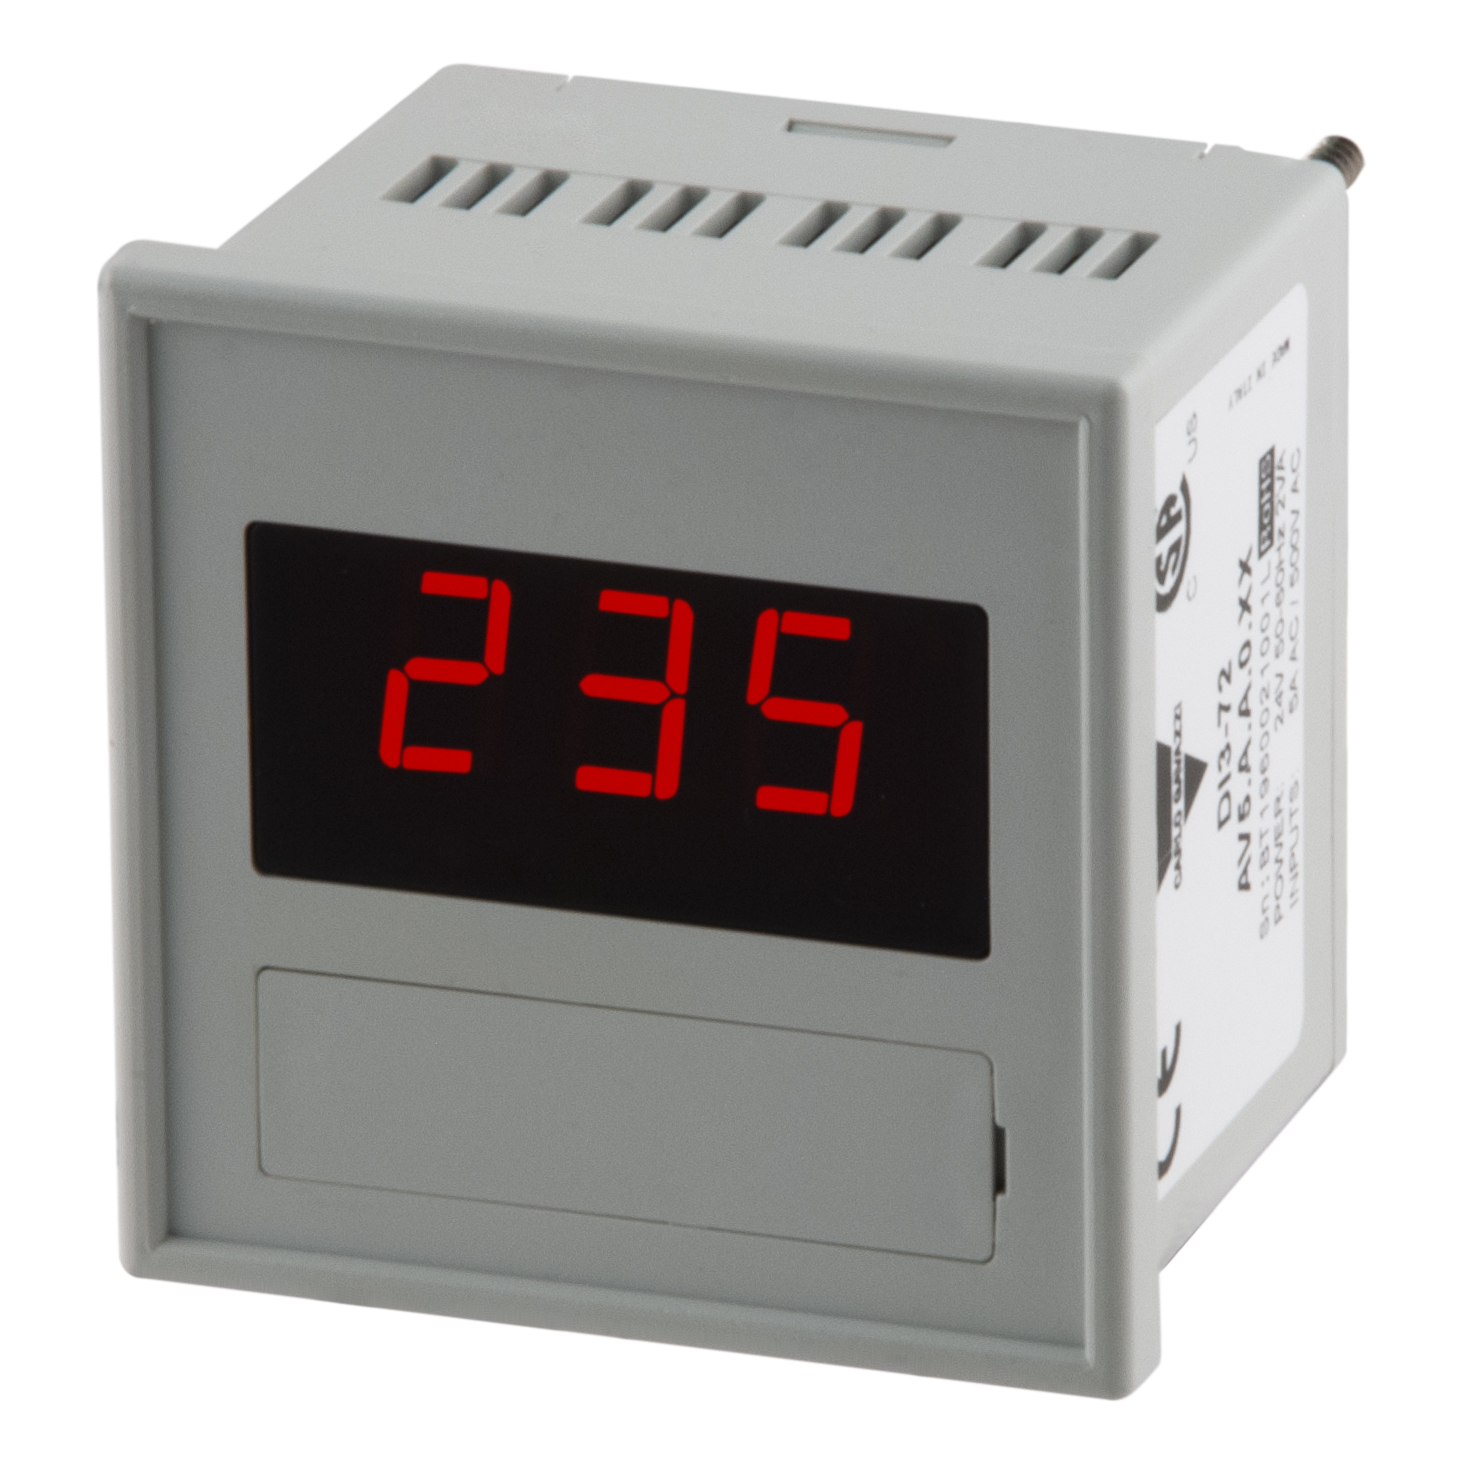 Digitala panelinstrument DI3 - 72